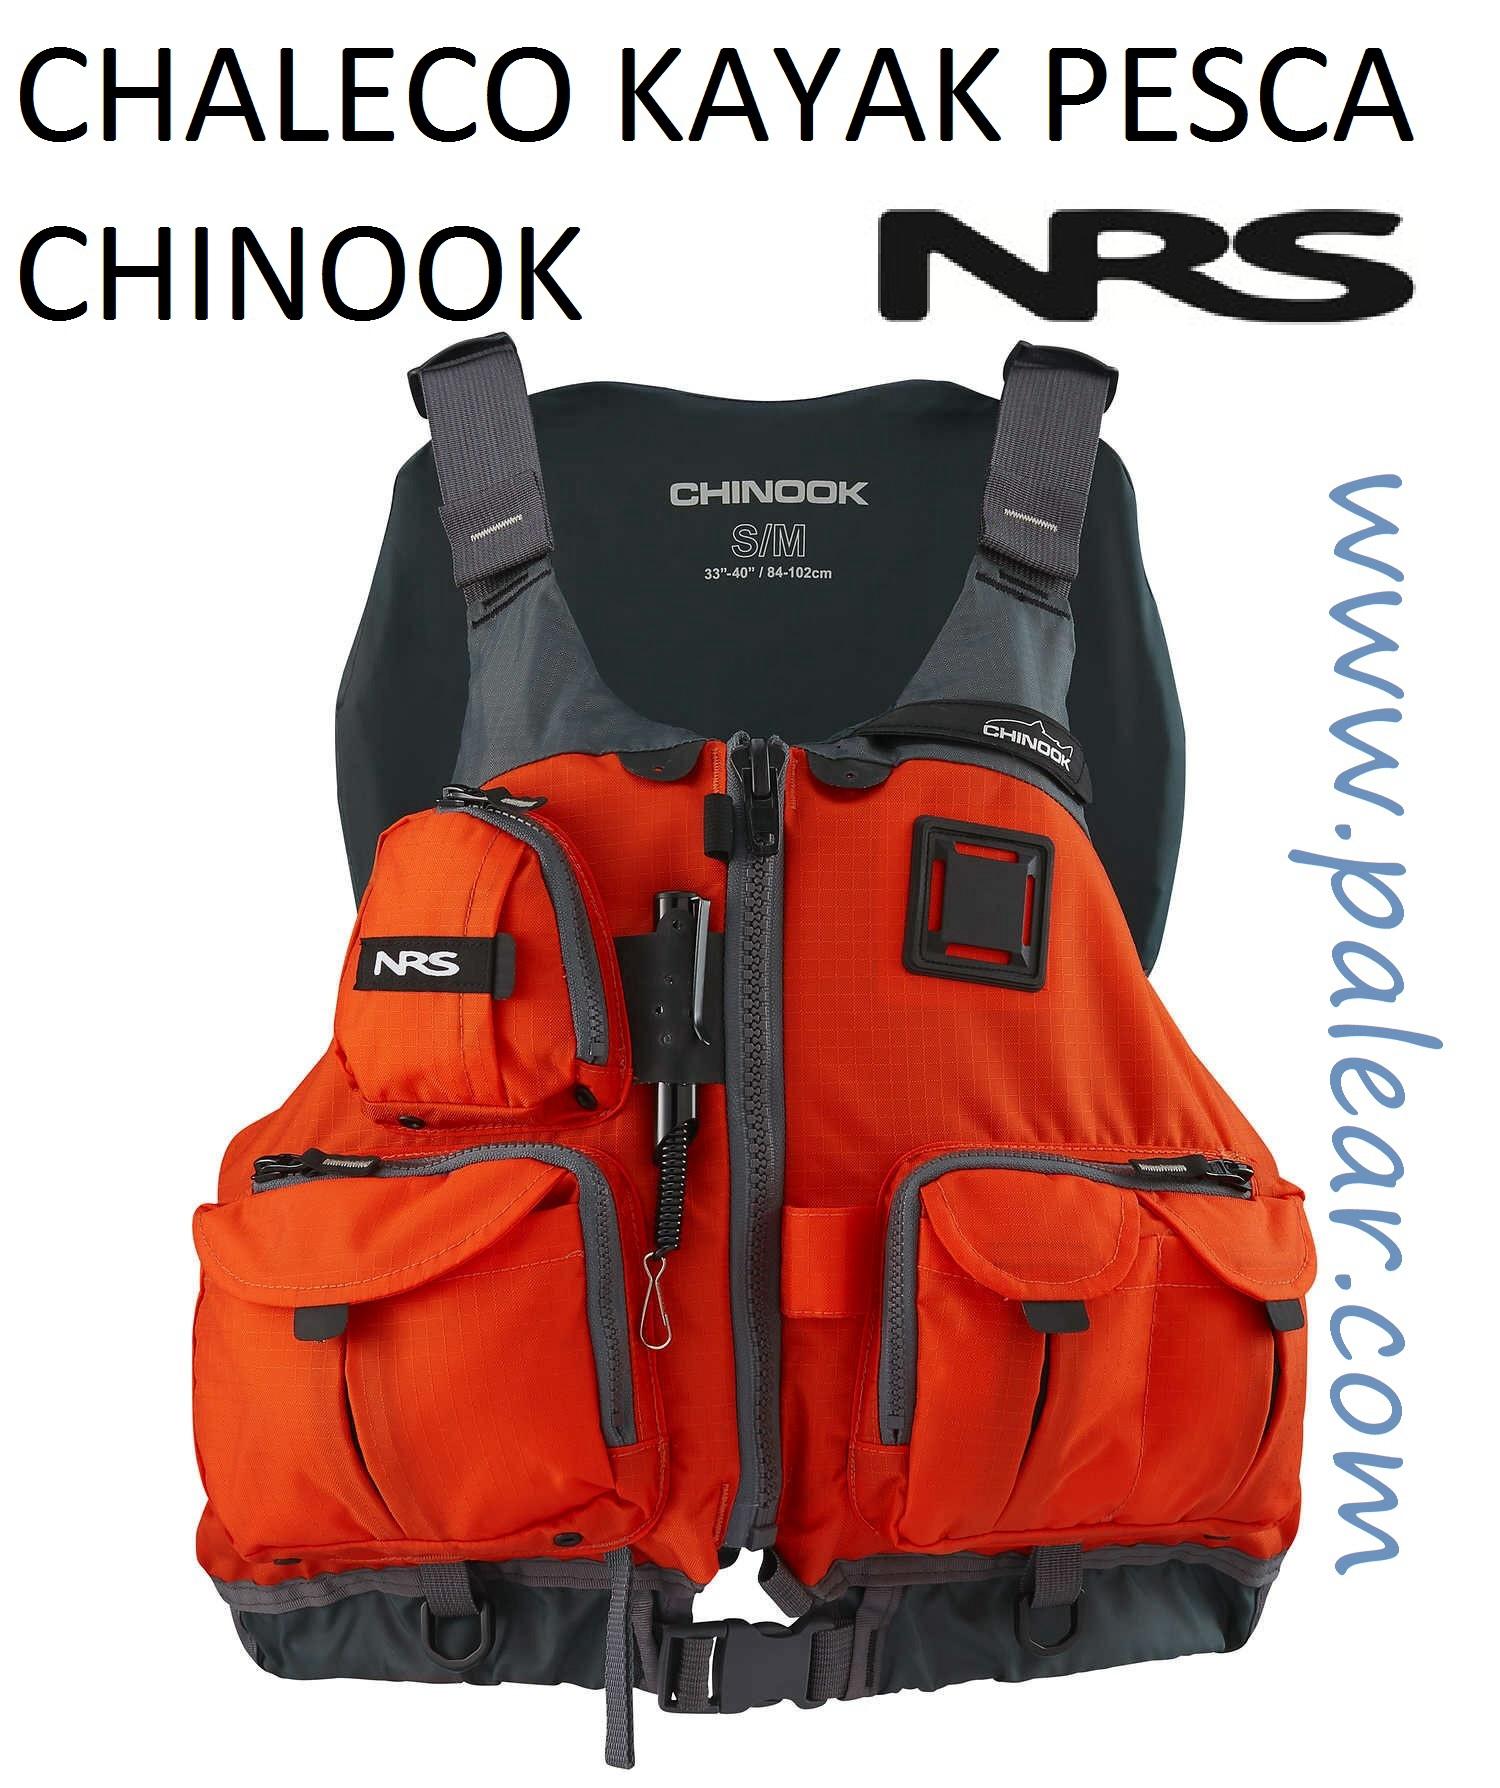 chaleco kayak pesca chinook de nsr Naranja rojo